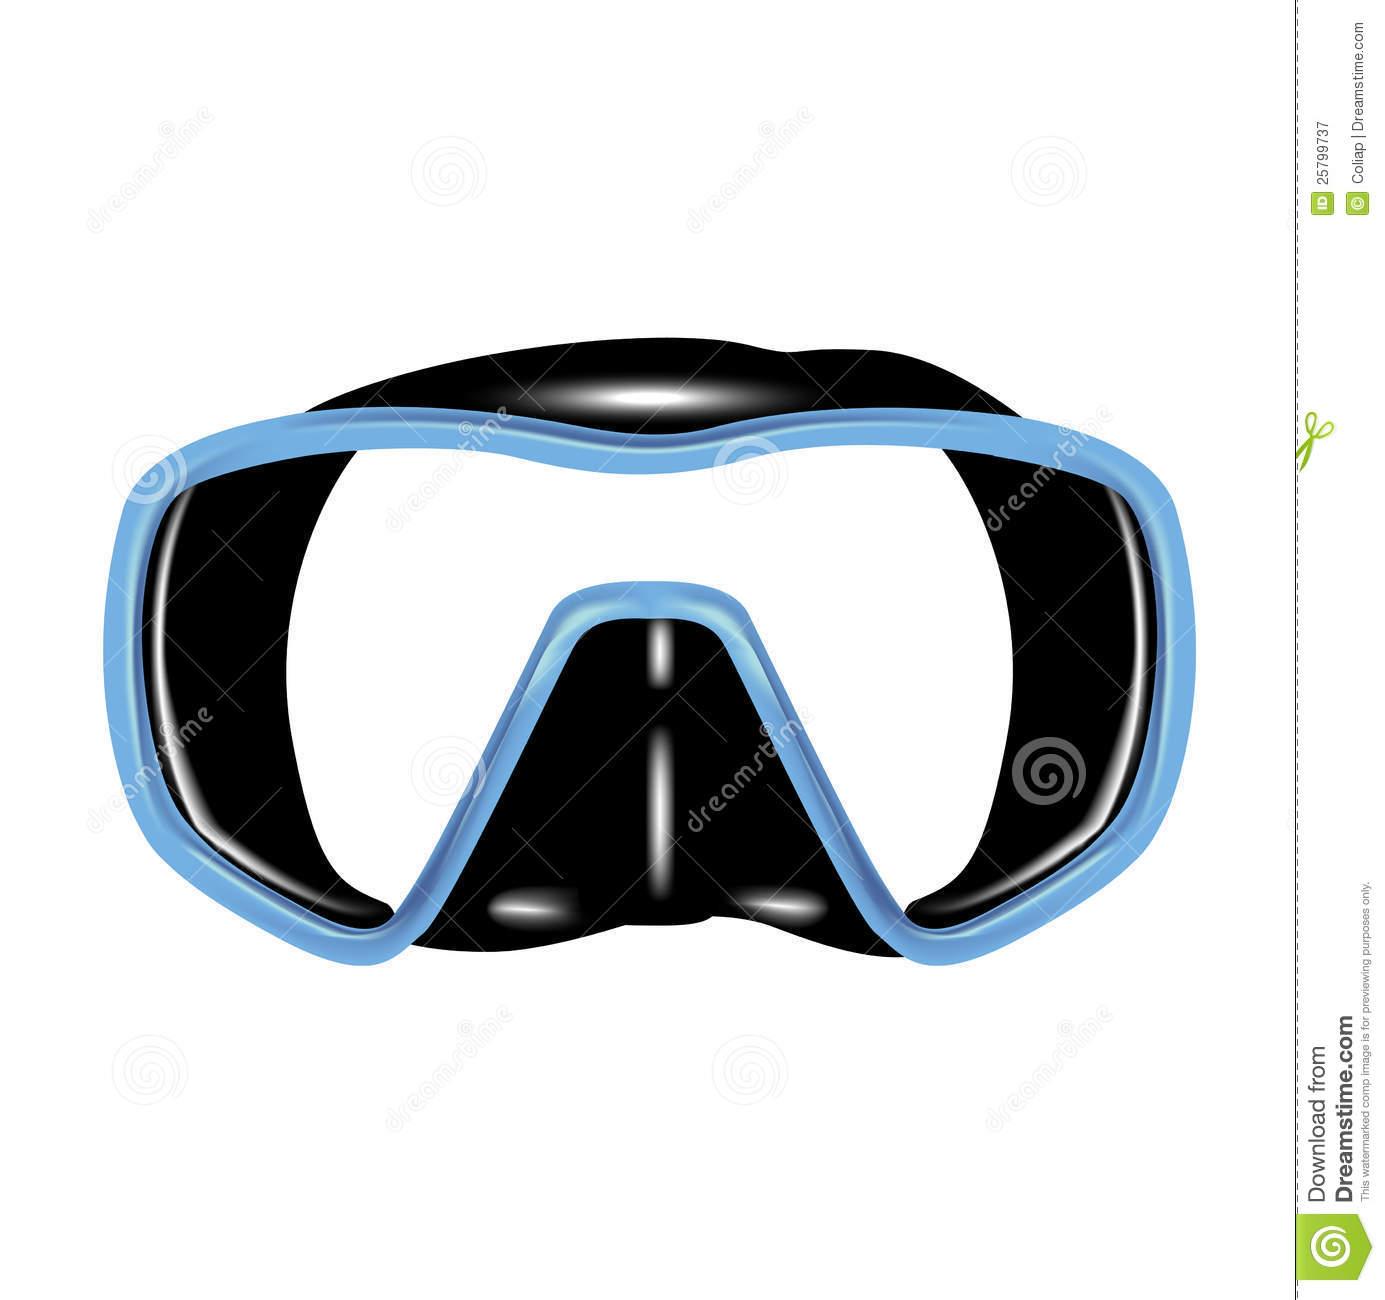 Scuba Diver clipart scuba gear #10